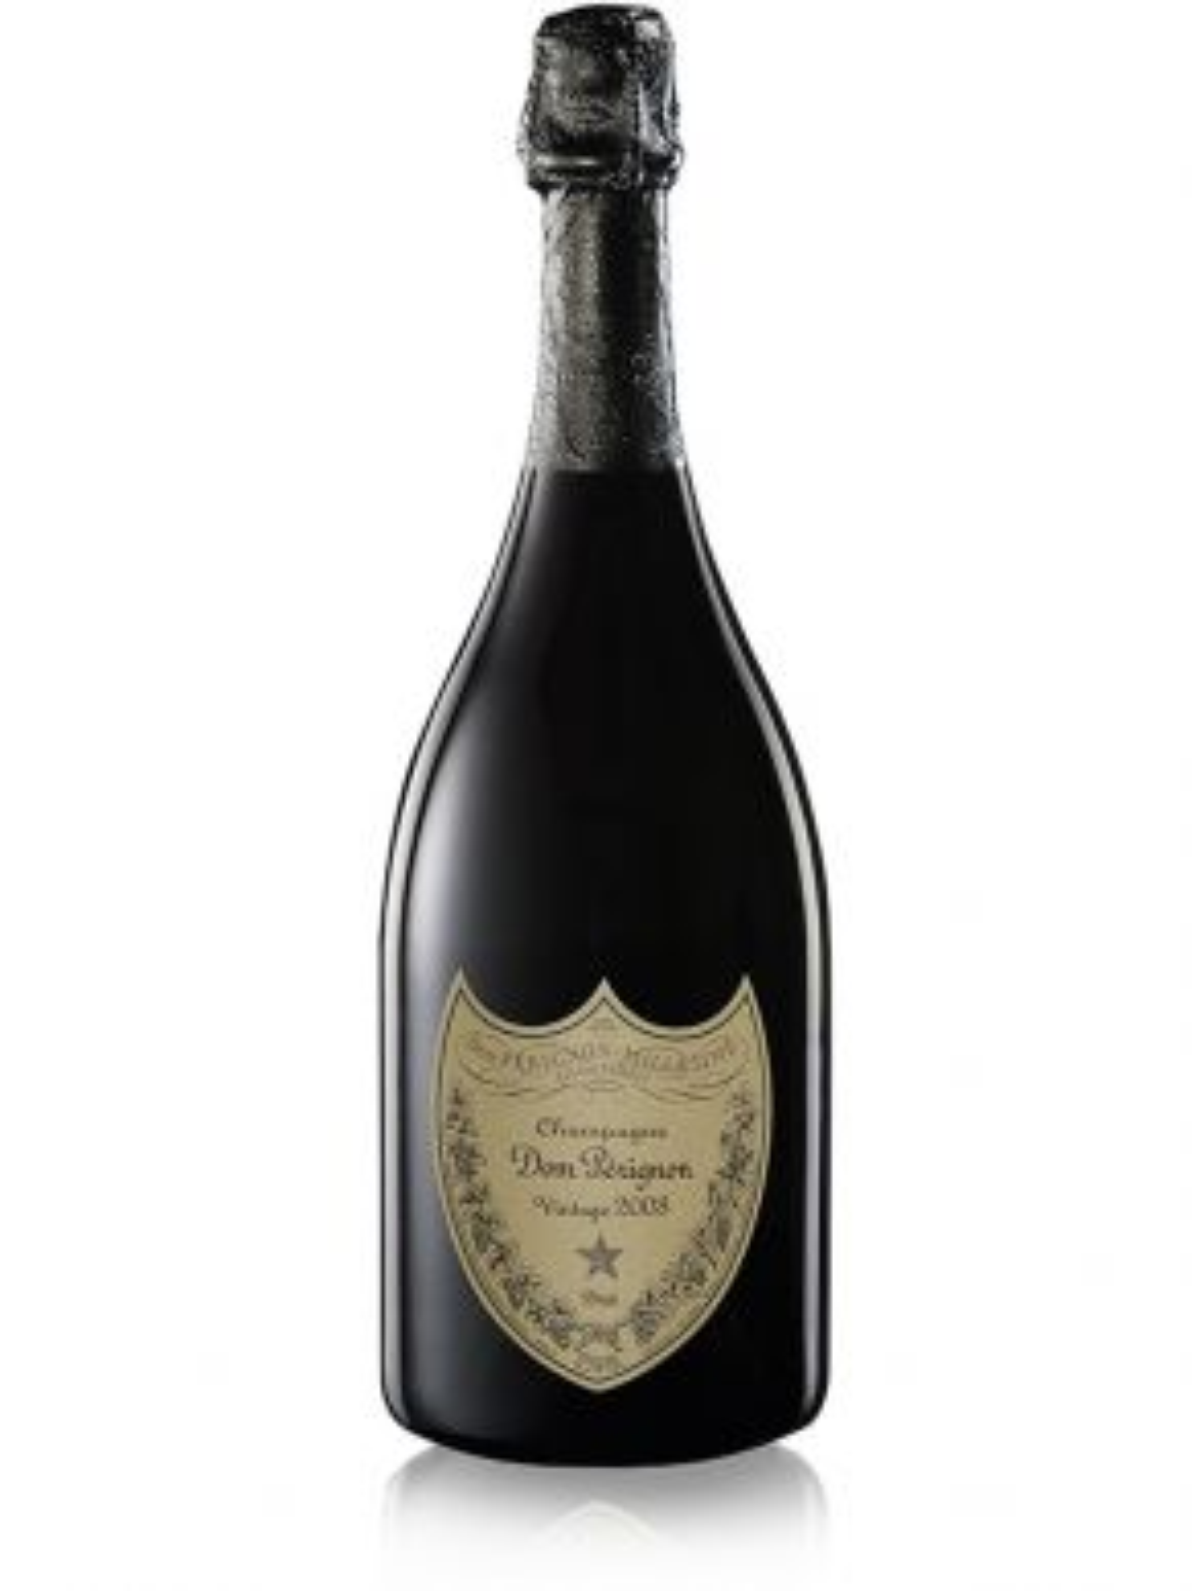 Dom Perignon 2008 Vintage Champagne 75cl